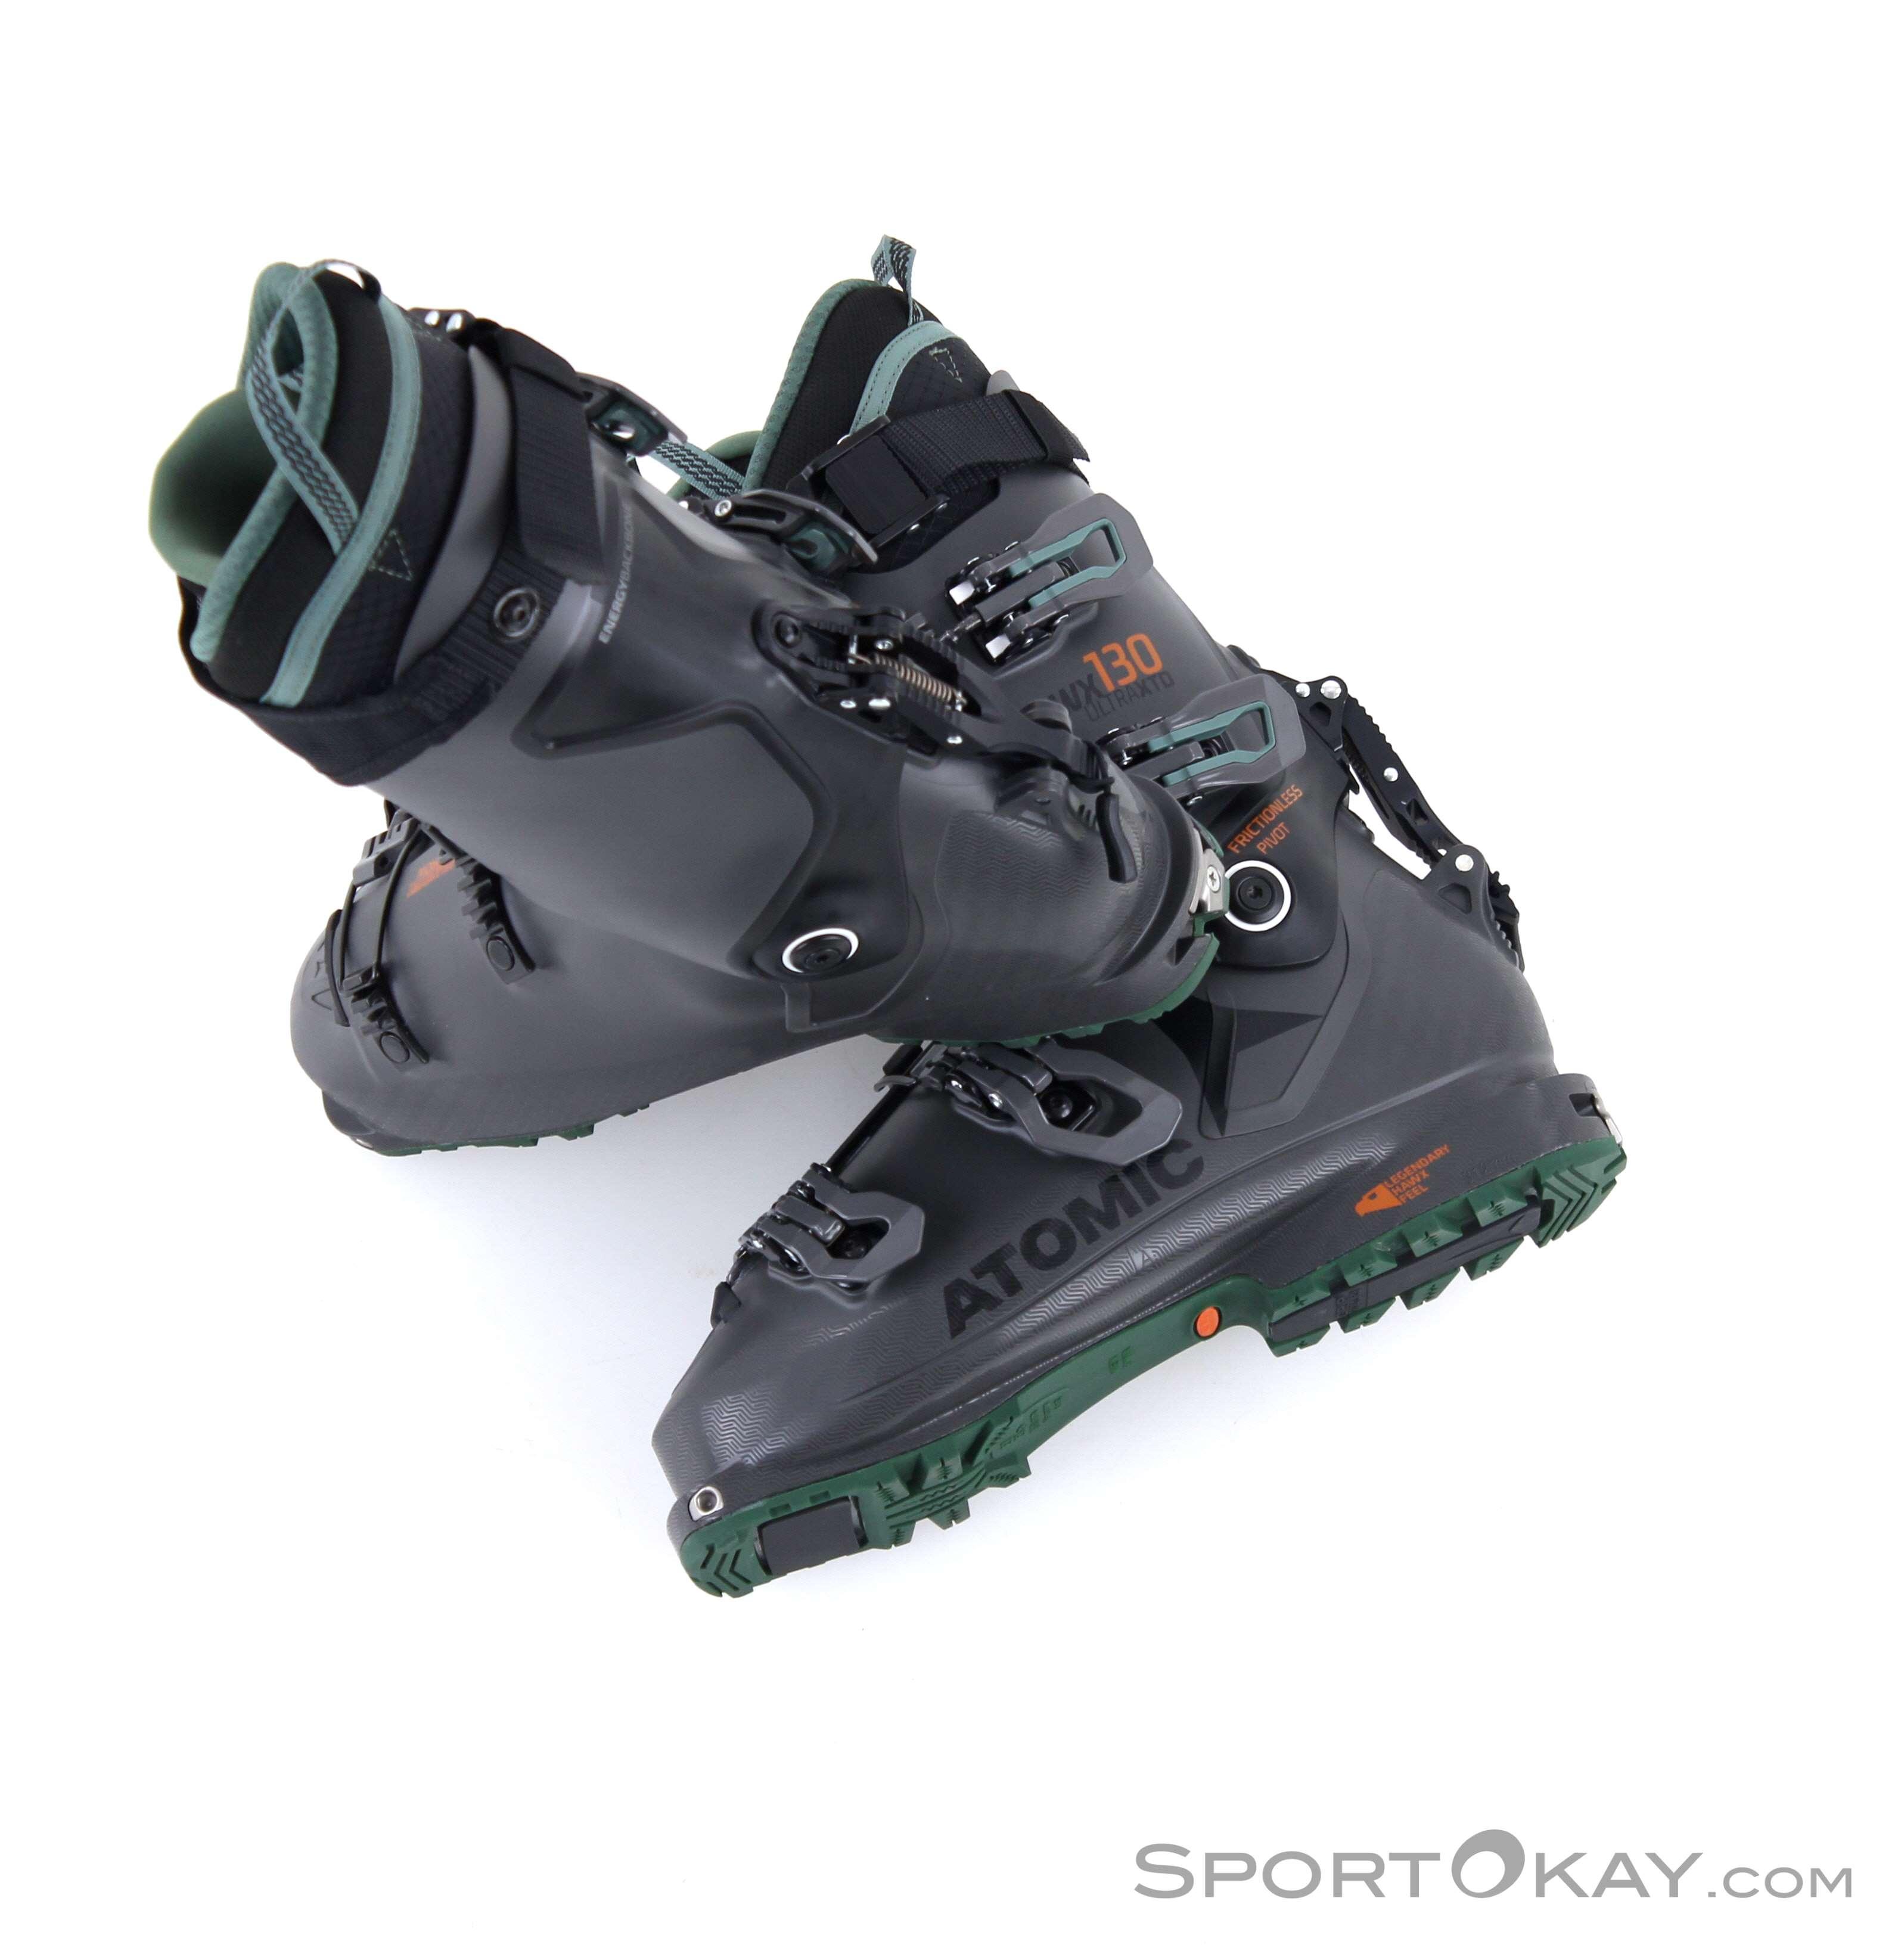 free shipping 5f4b3 43317 Atomic Atomic Hawx Ultra XTD 130 Ski Touring Boots